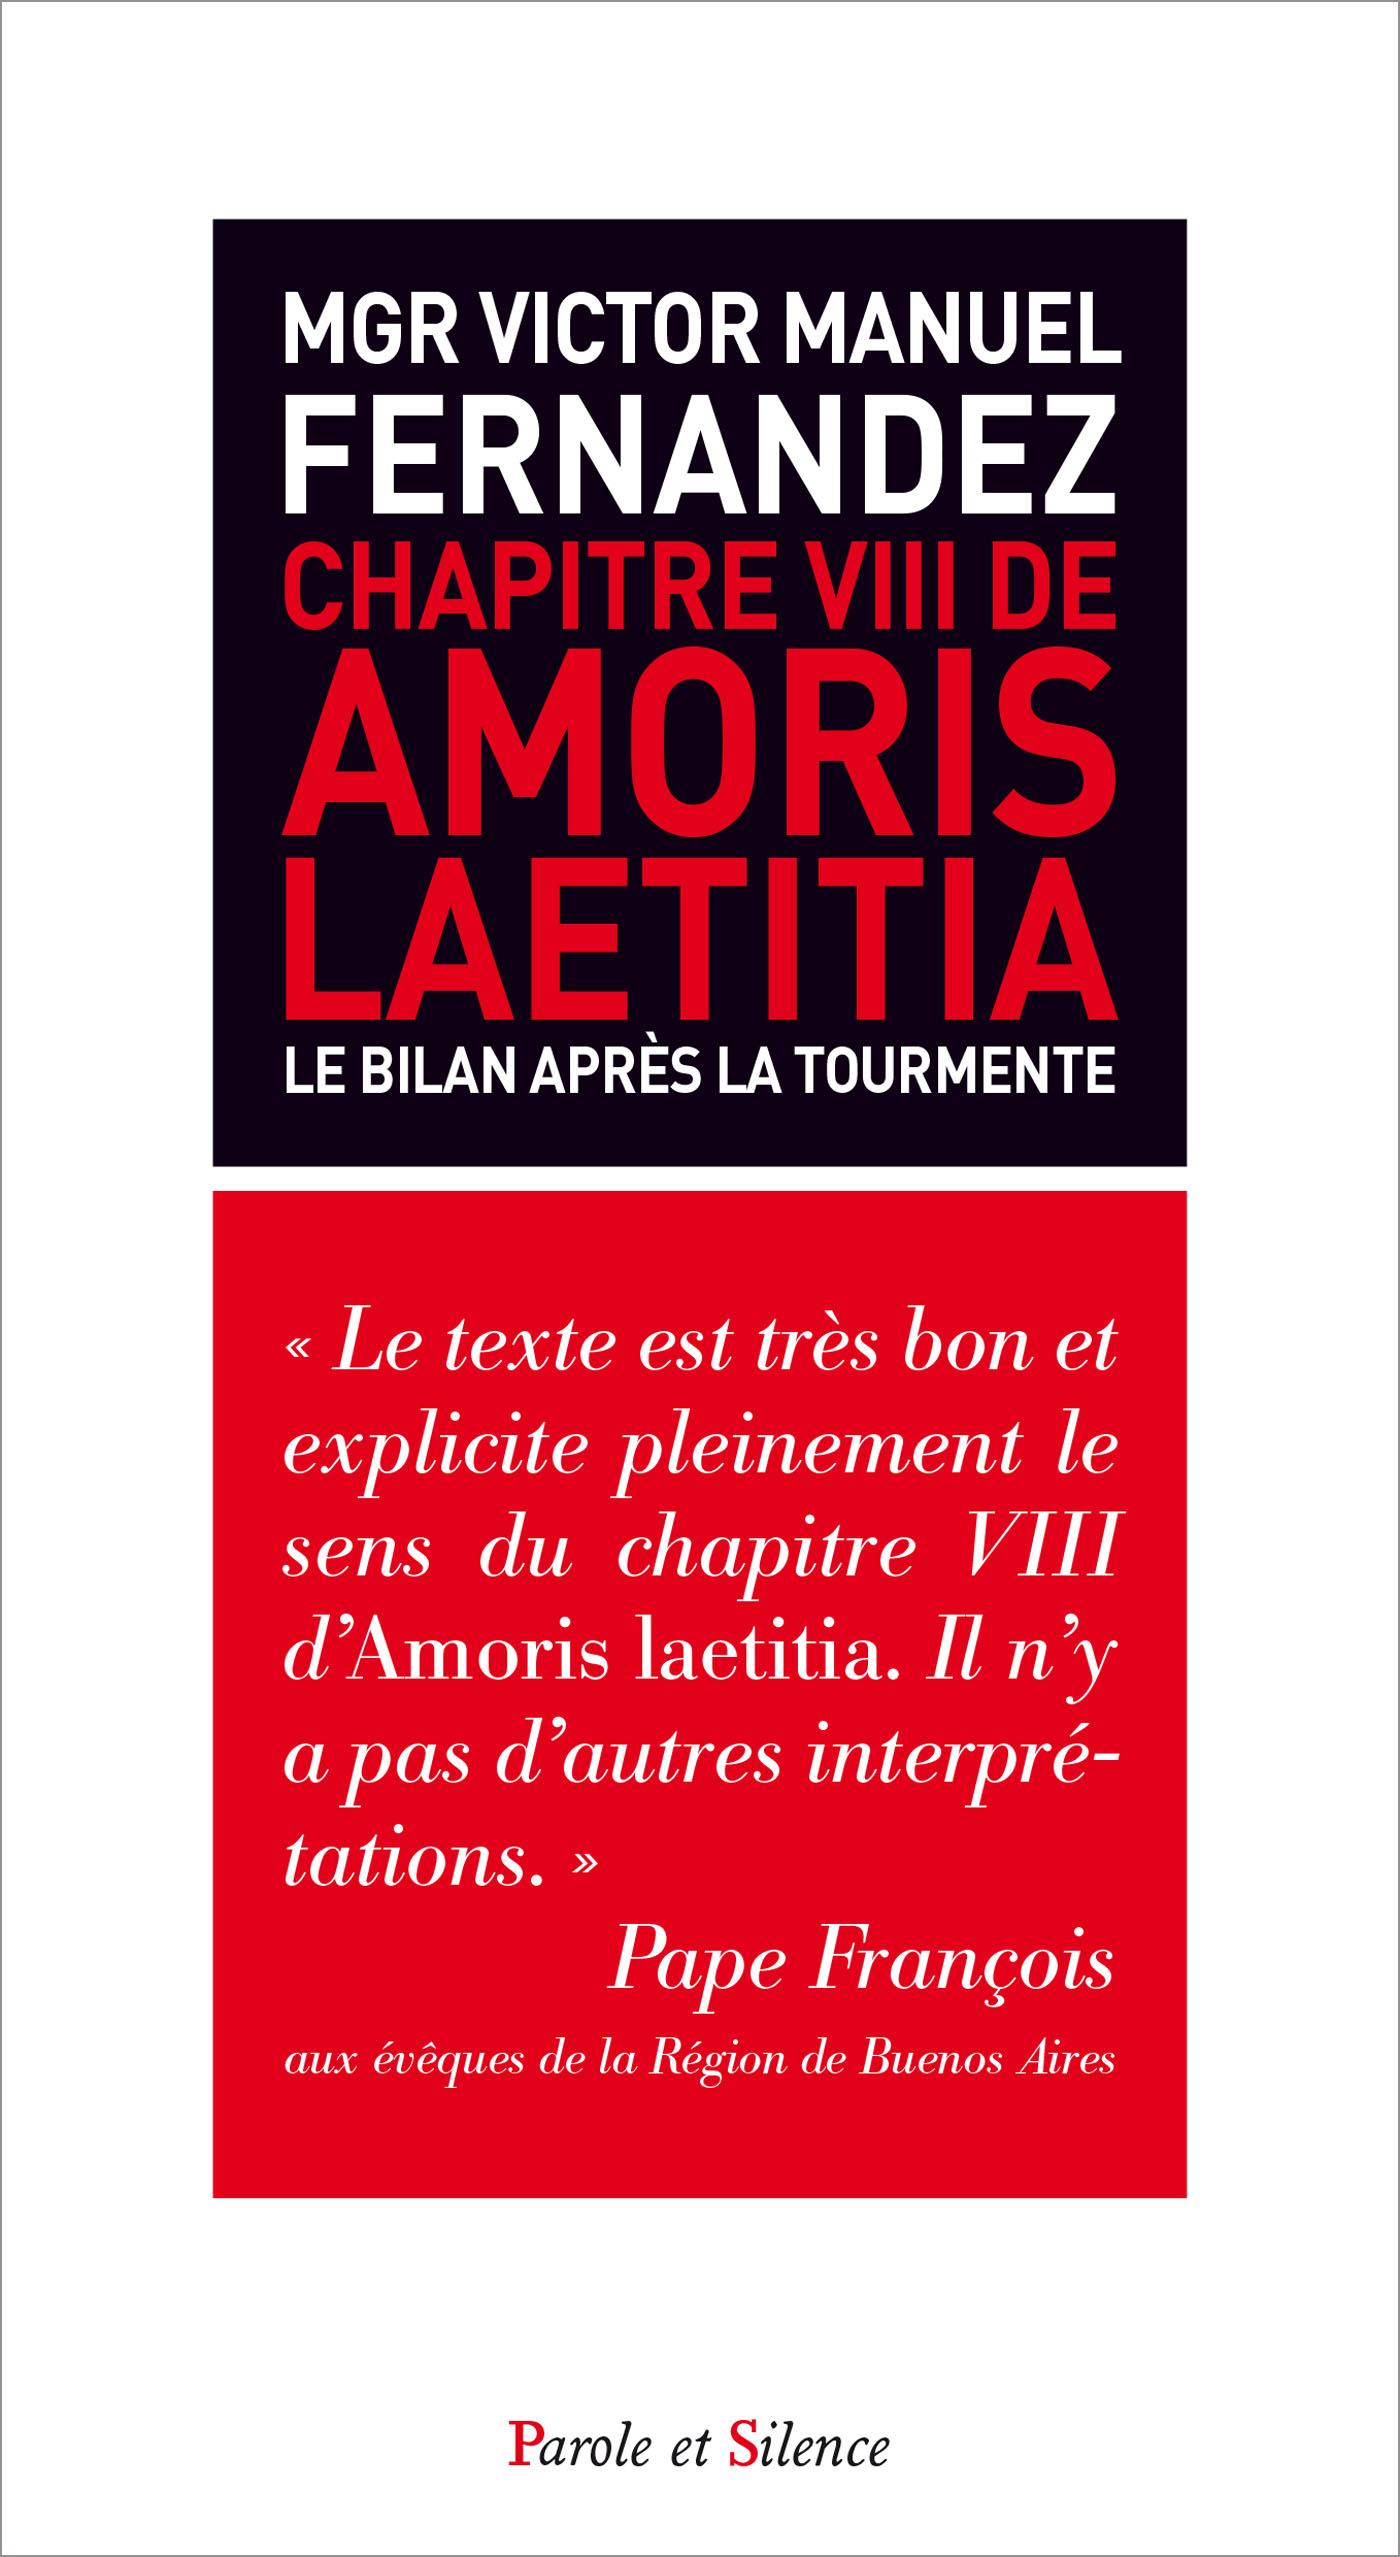 Le chapitre VIII de Amoris laetitia